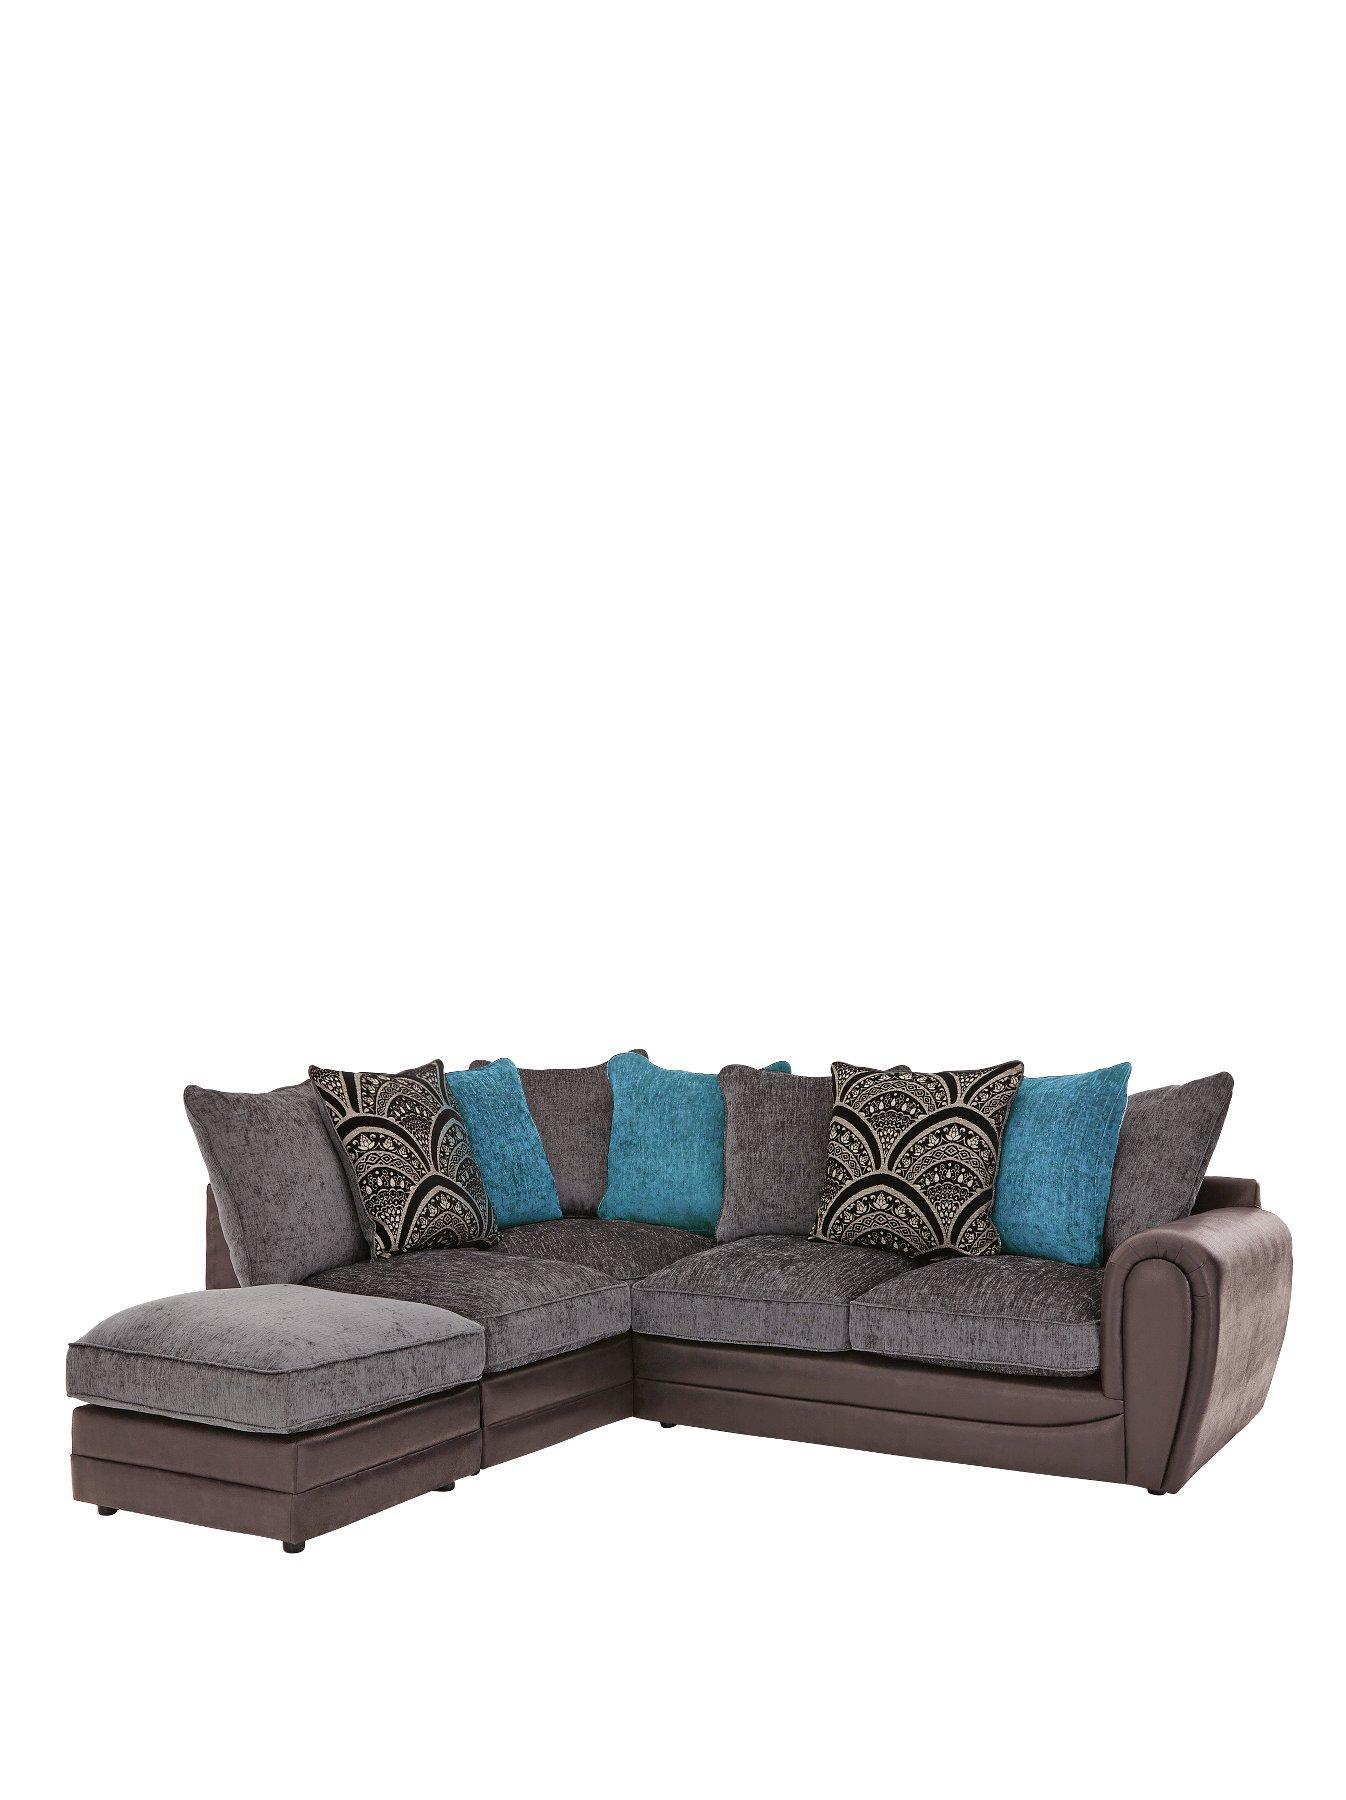 gatsby left hand single arm corner chaise plus footstool